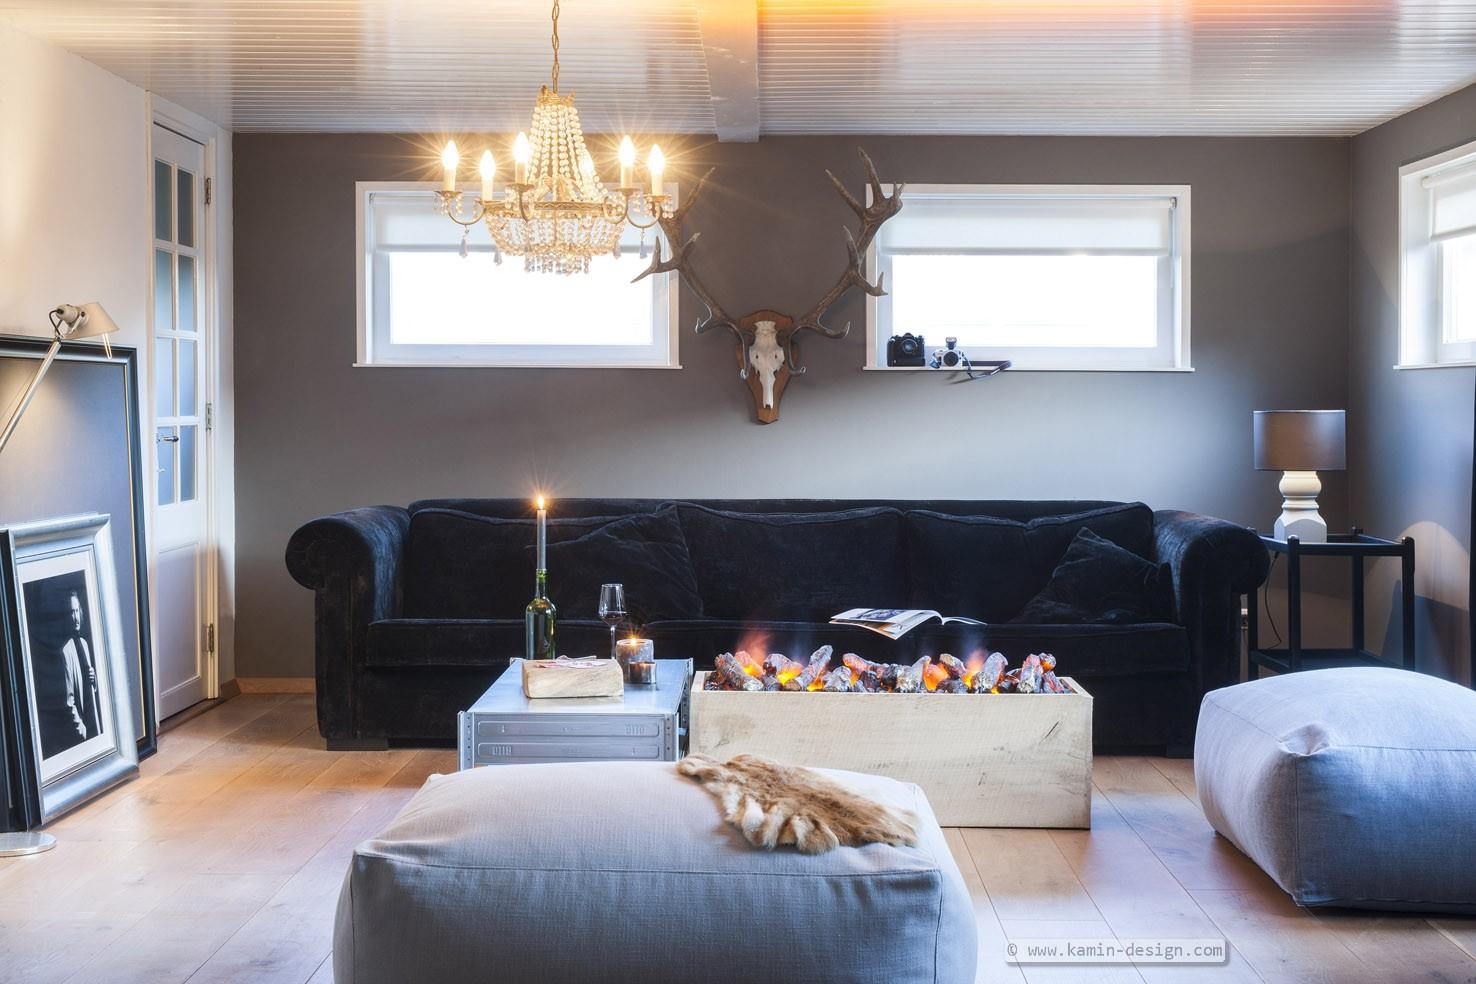 dimplex cassette 500r retail kamineinsatz opti myst 3d effektfeuer elektrokamin. Black Bedroom Furniture Sets. Home Design Ideas